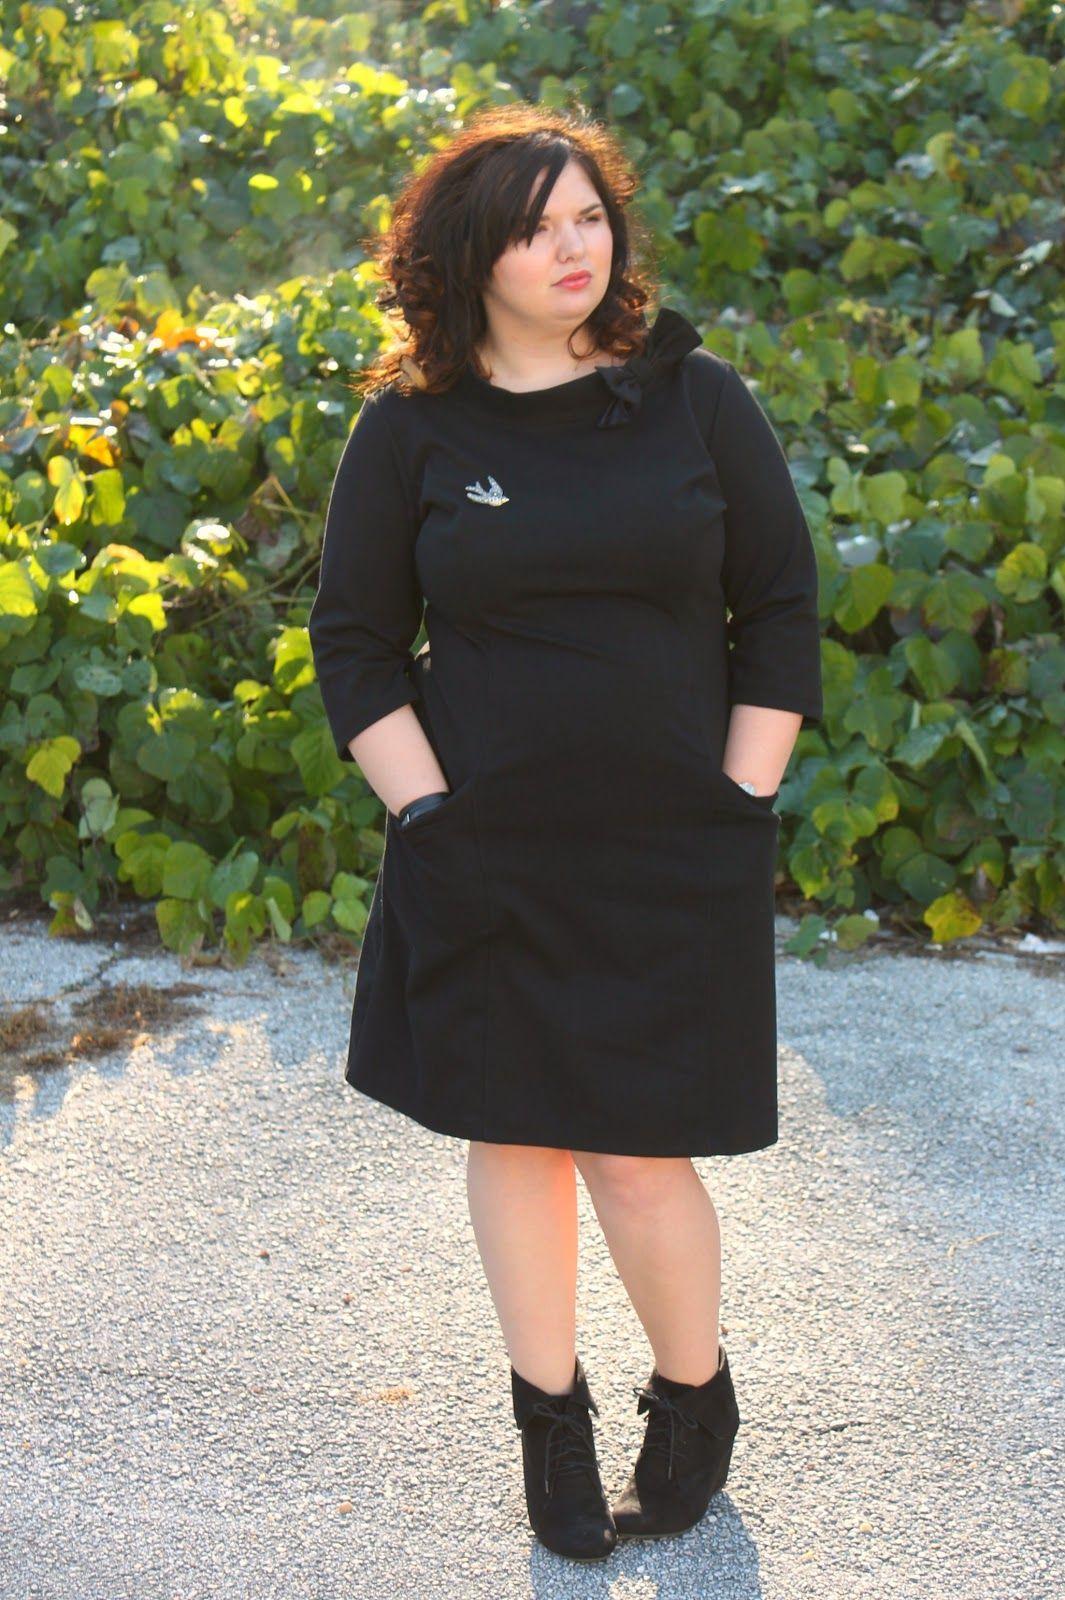 Hems For Her Trendy Plus Size Fashion For Women Eshakti Bow Dress